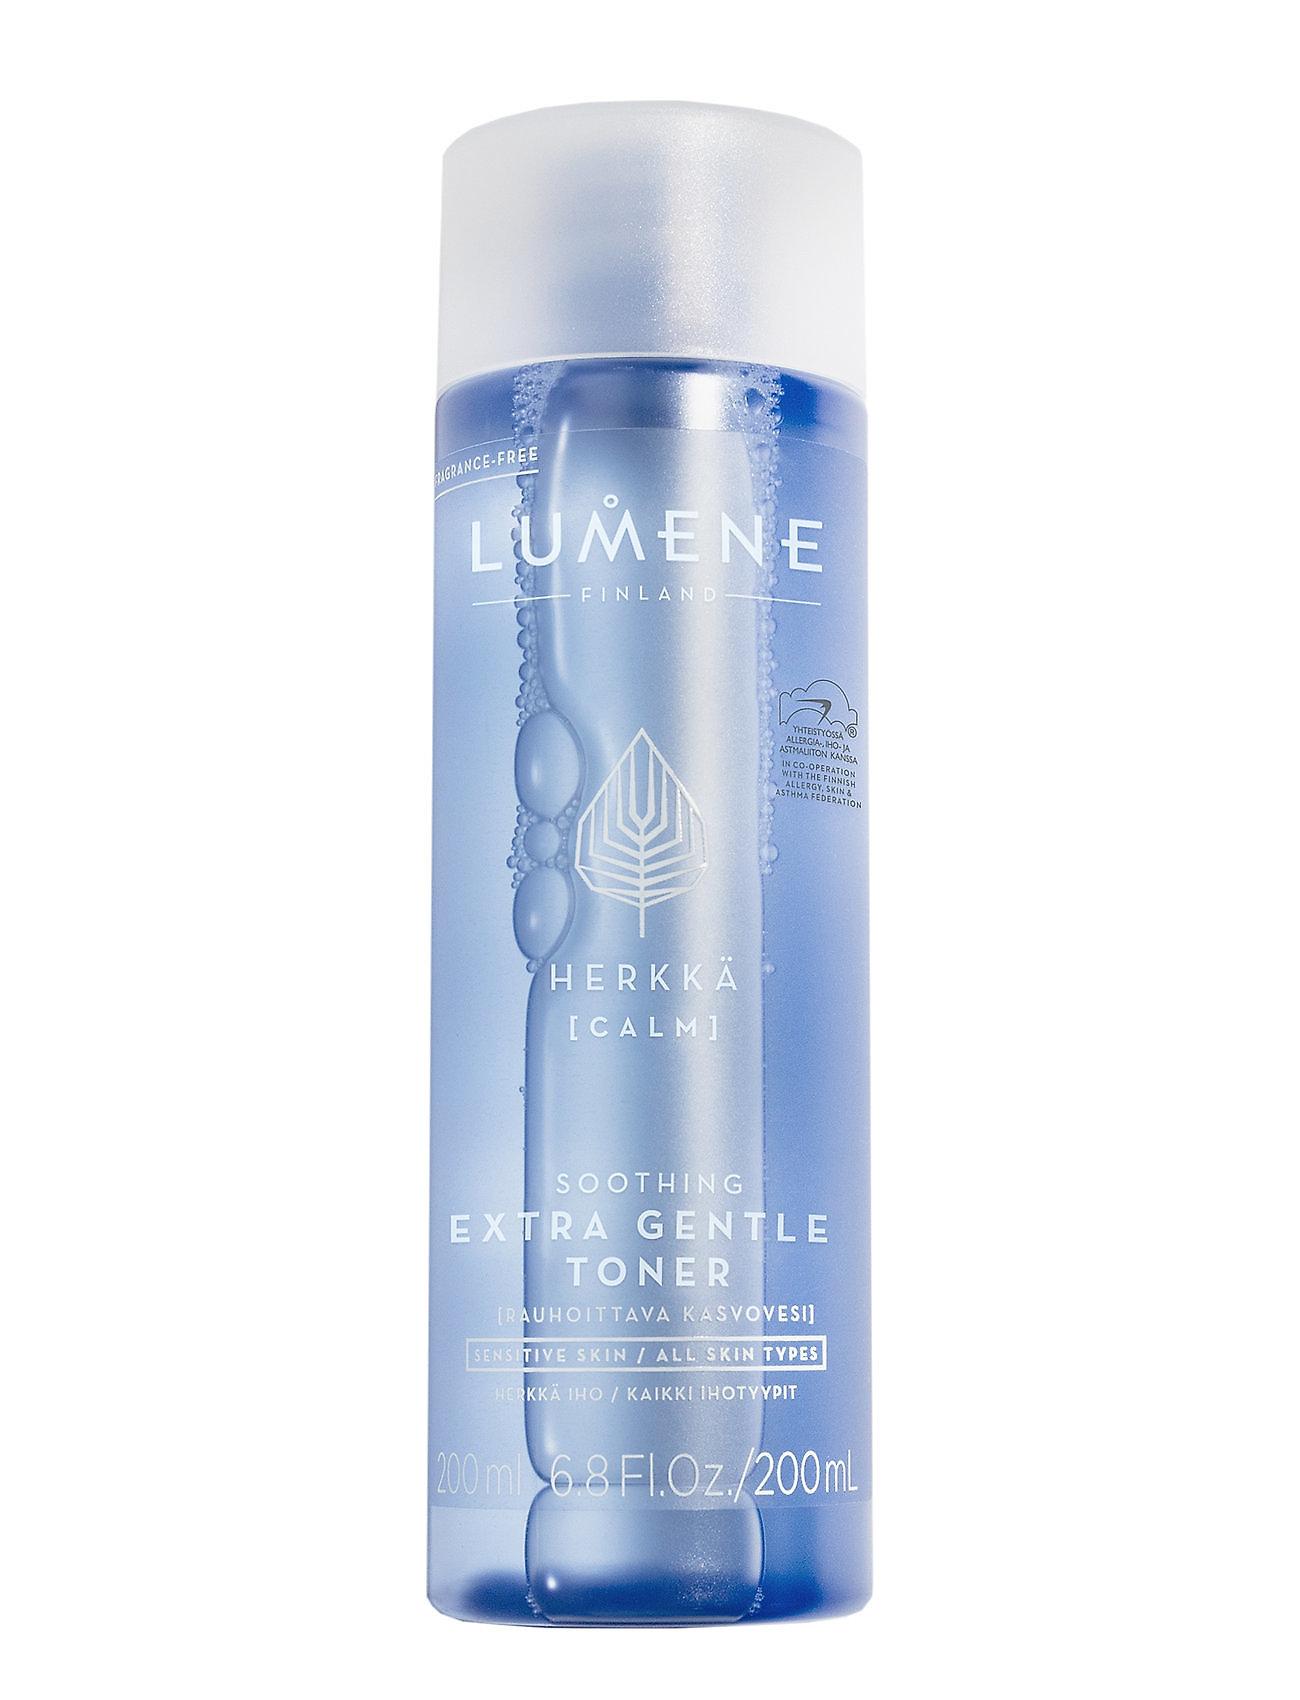 Image of HerkkÄ Soothing Extra Gentle T R Beauty WOMEN Skin Care Face T Rs Nude LUMENE (3297437437)